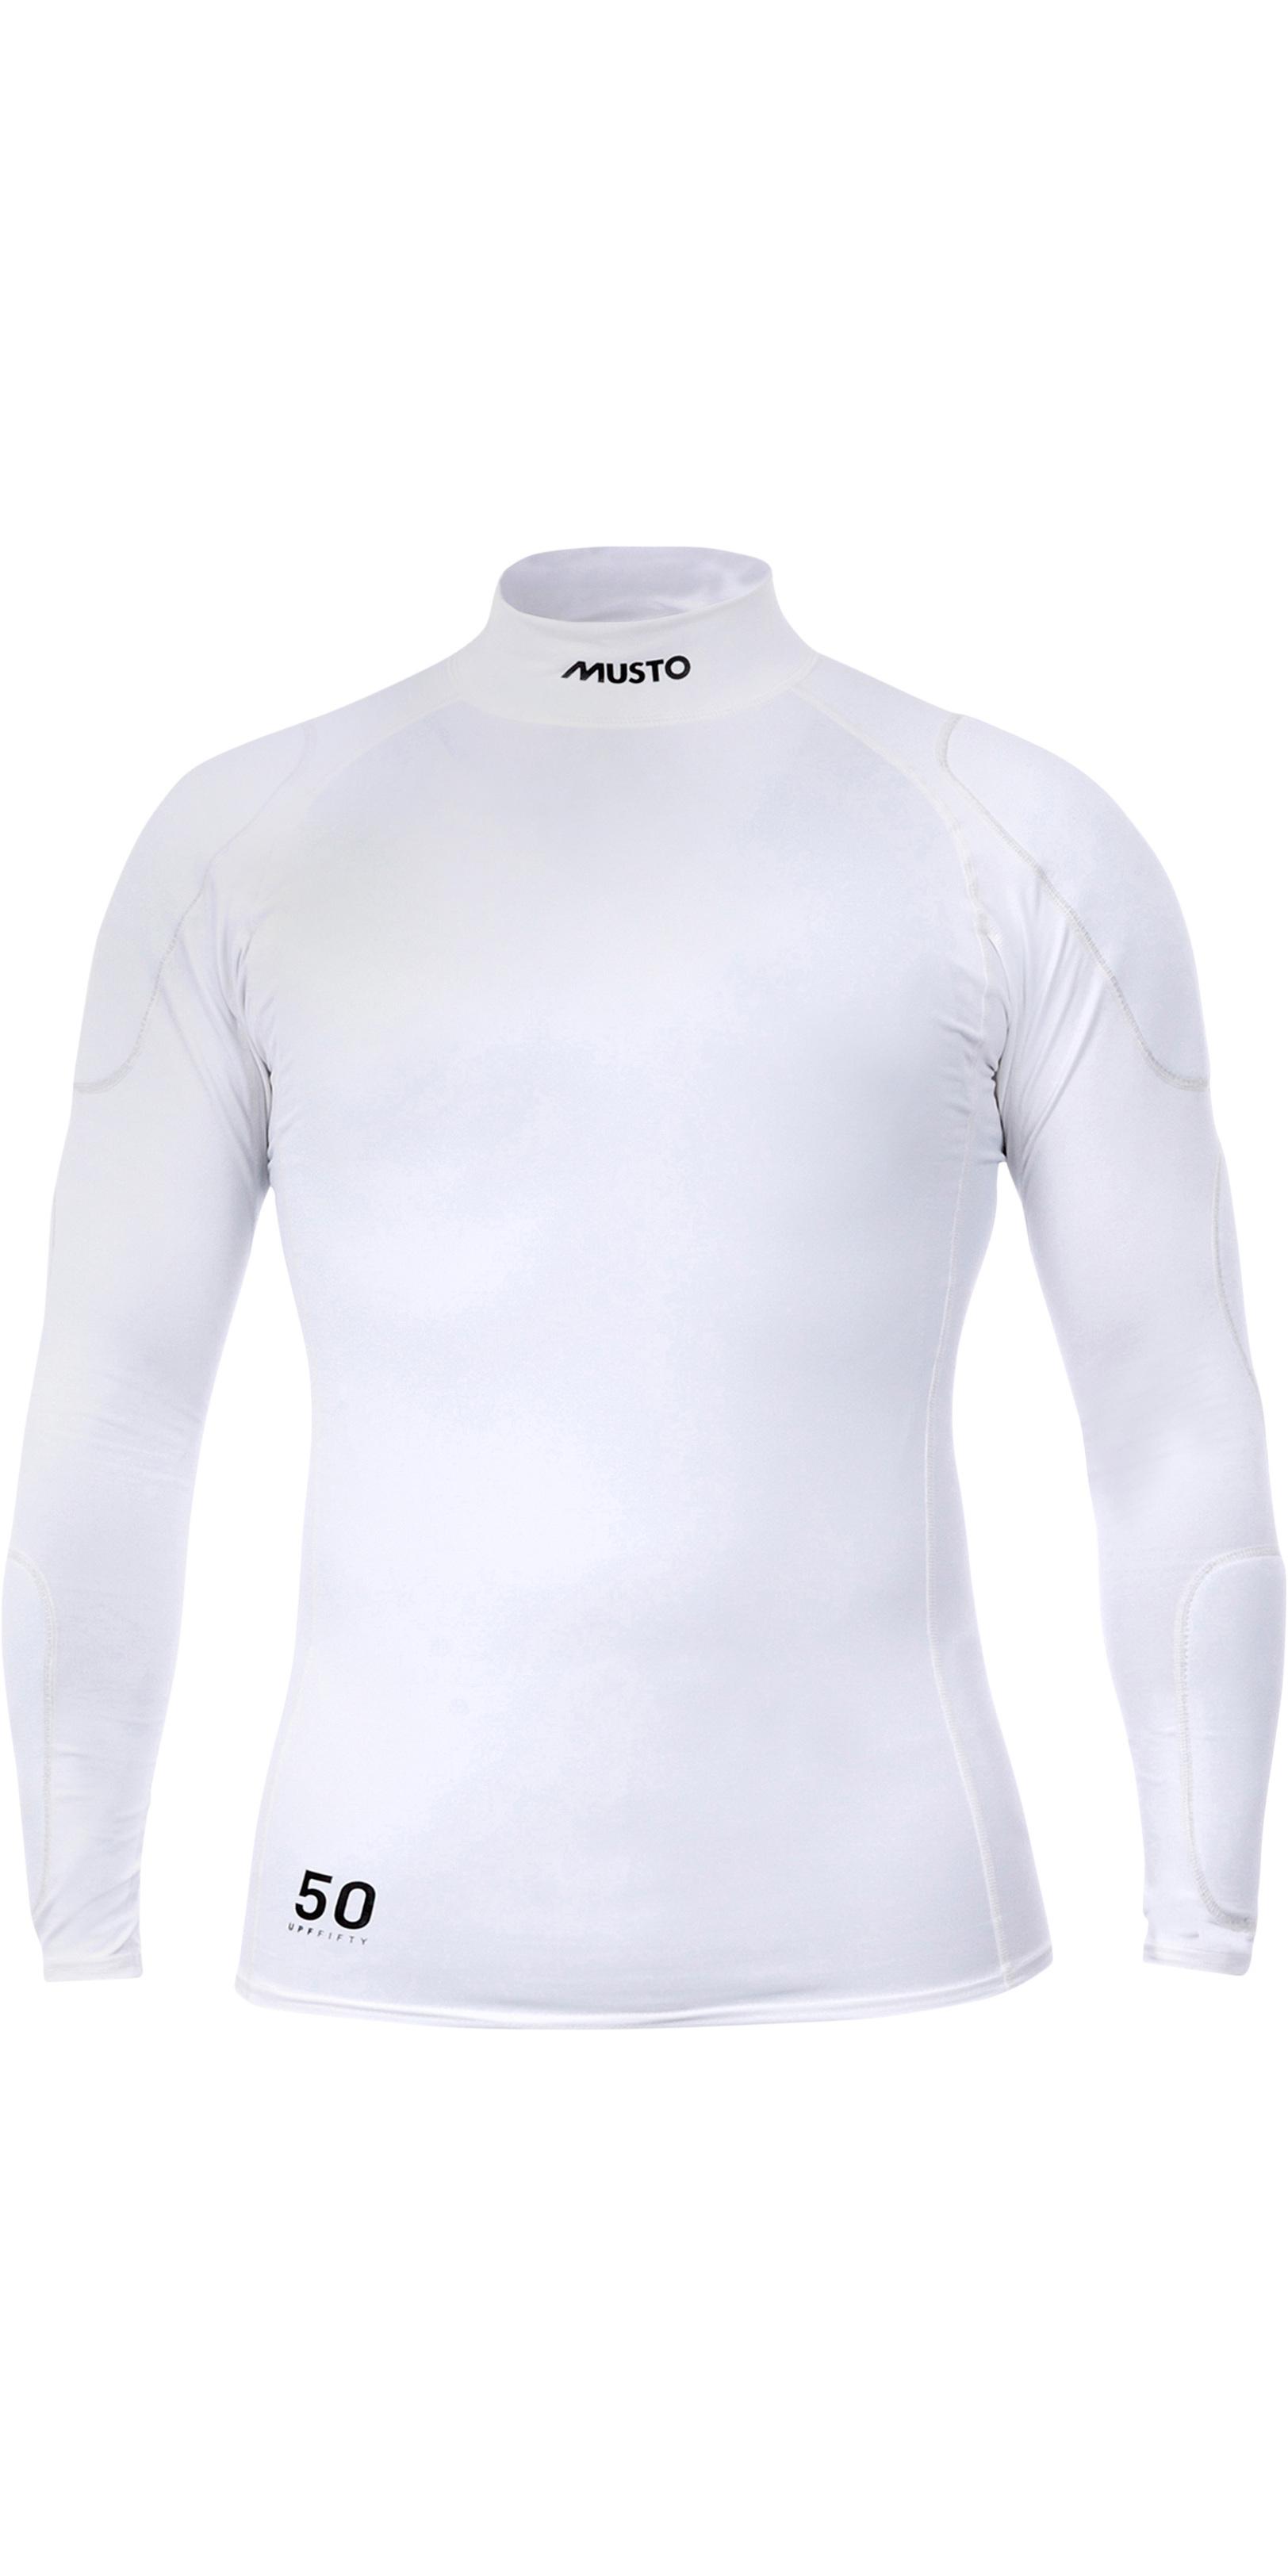 Musto Sunblock Long Sleeve Rash Guard 2019 White